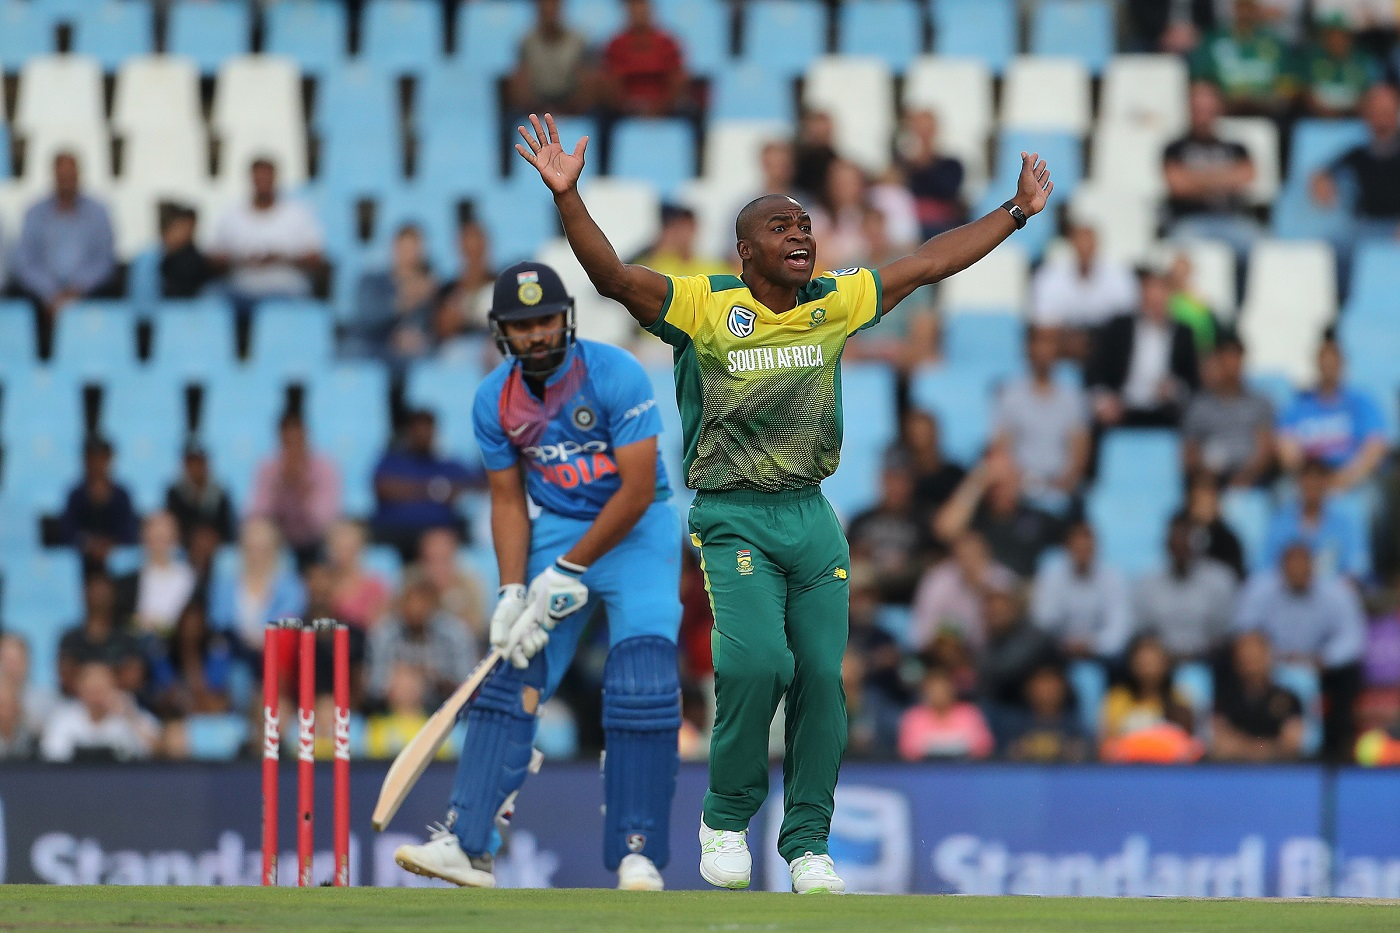 IPL 2018: Junior Dala Replaces Chris Morris For Delhi Daredevils